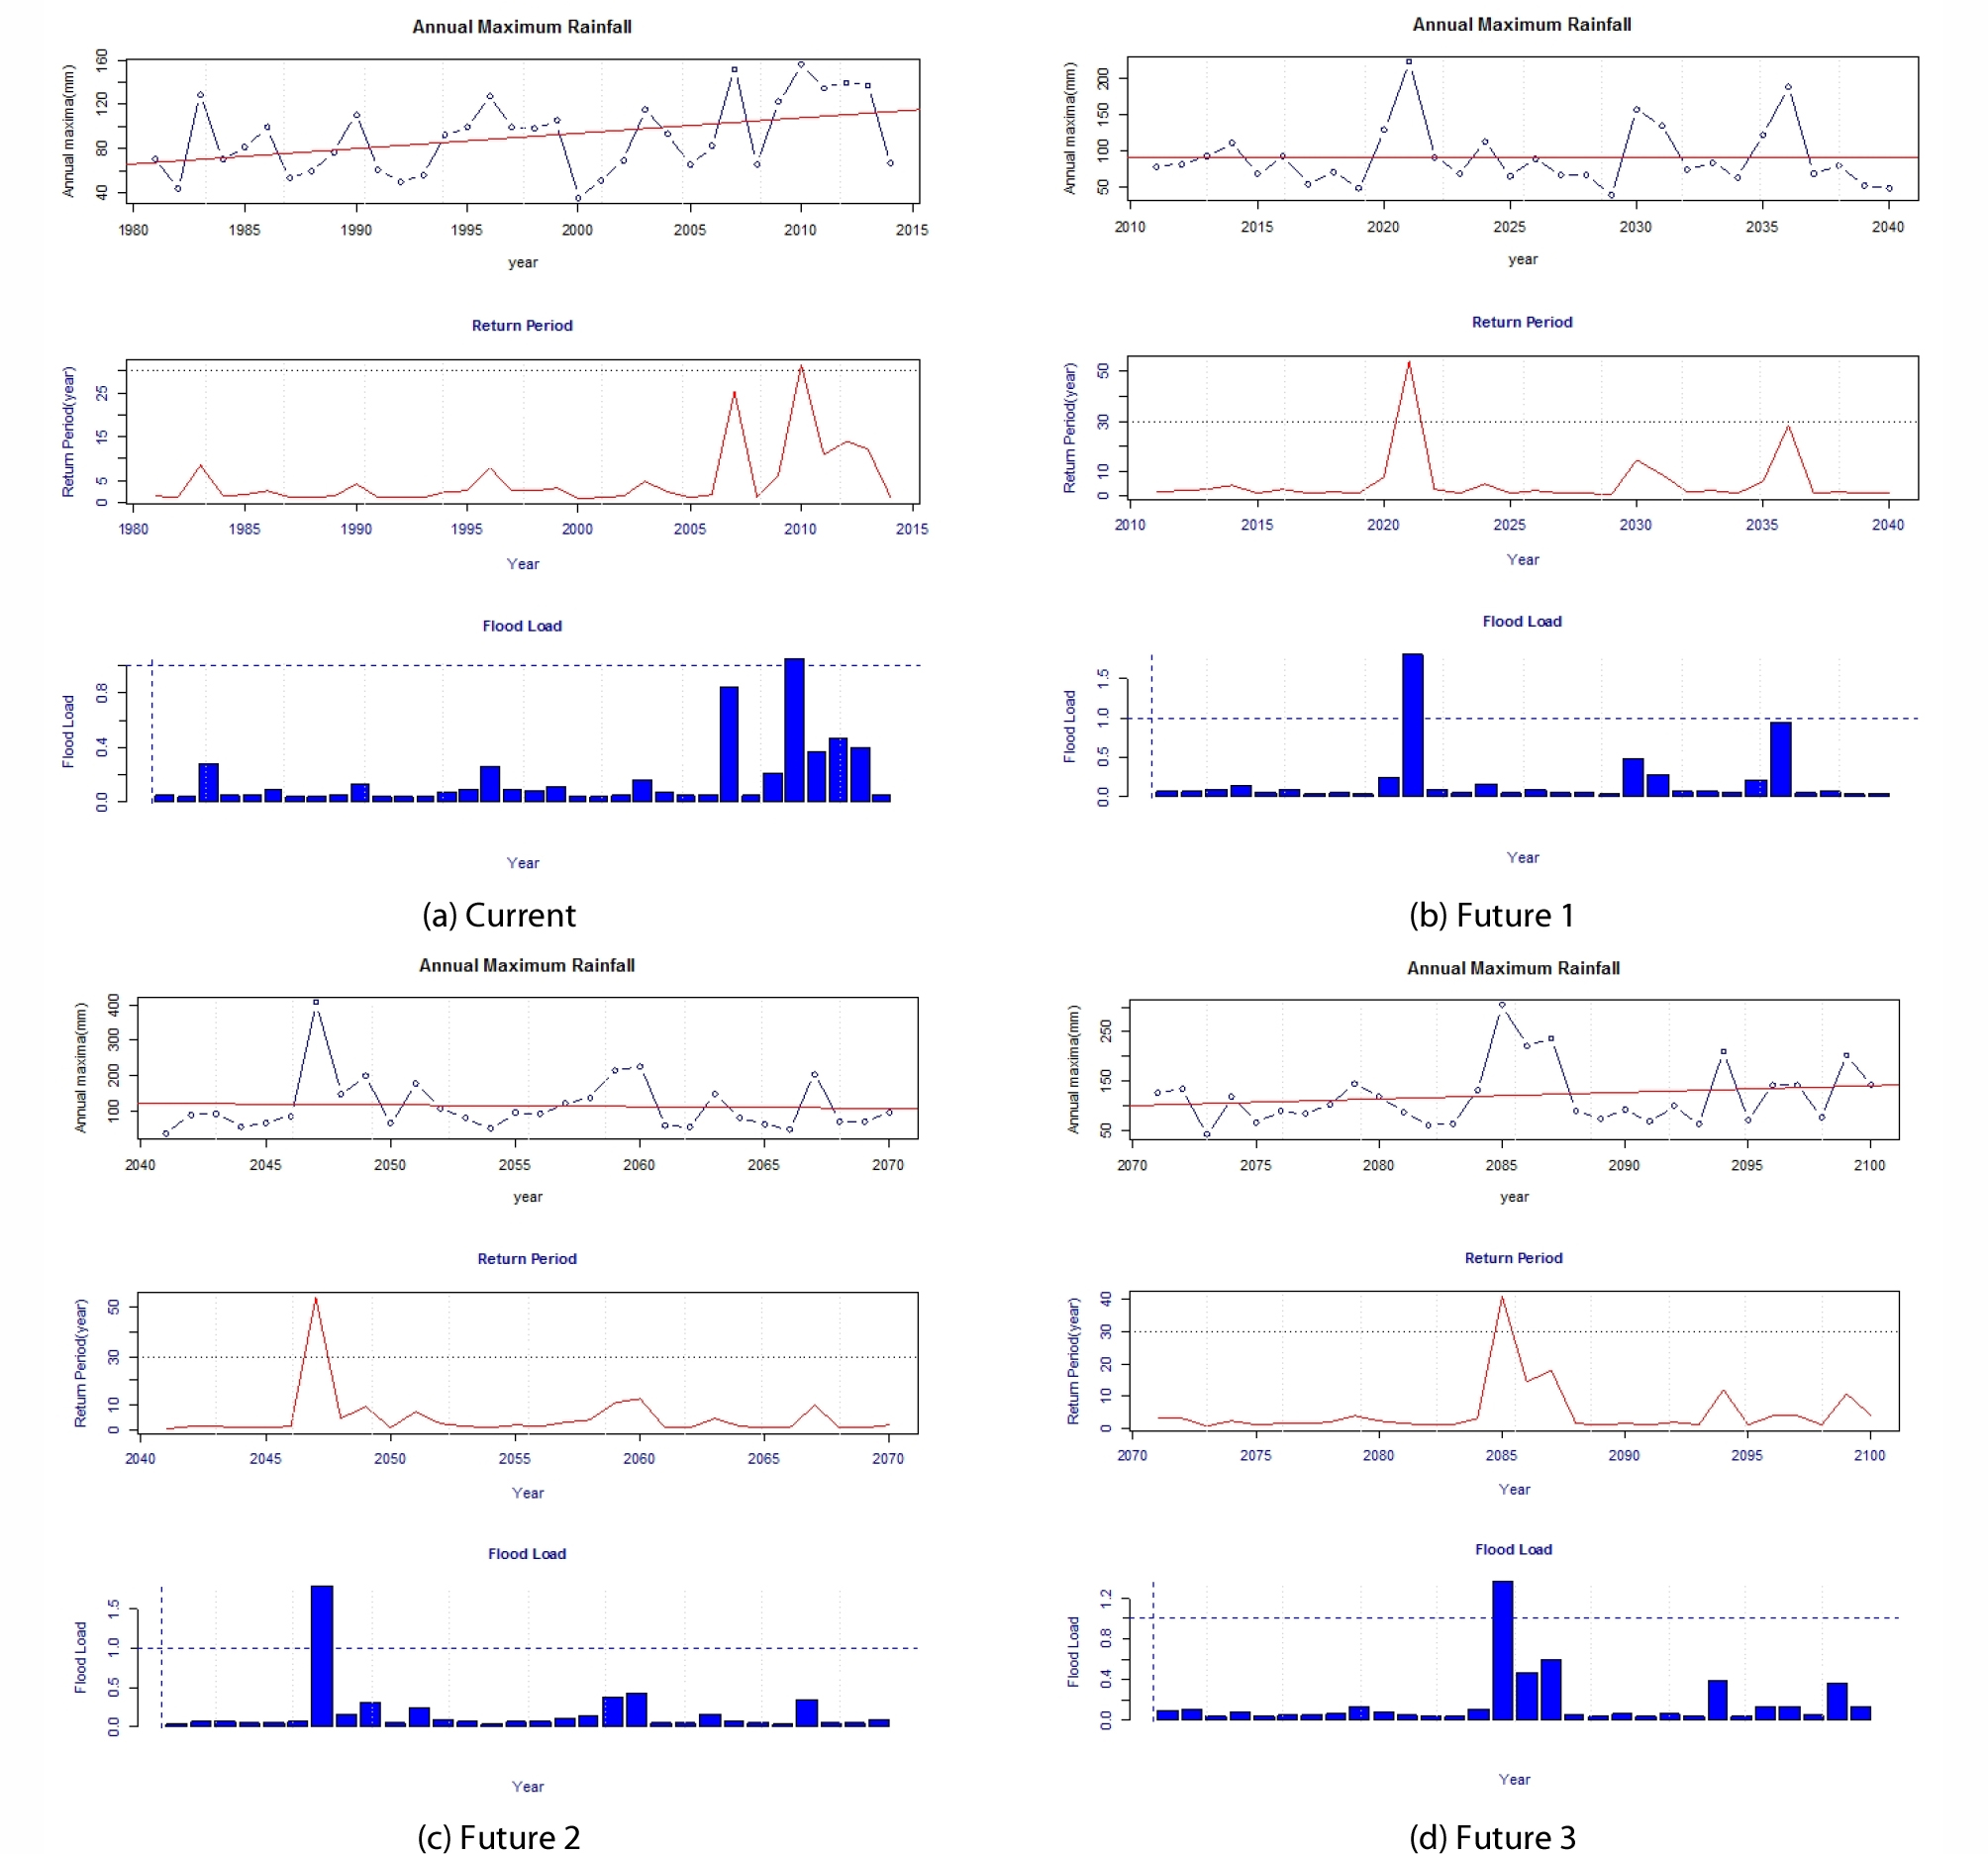 http://static.apub.kr/journalsite/sites/ksce/2018-038-06/N0110380604/images/Figure_KSCE_38_6_04_F4.jpg